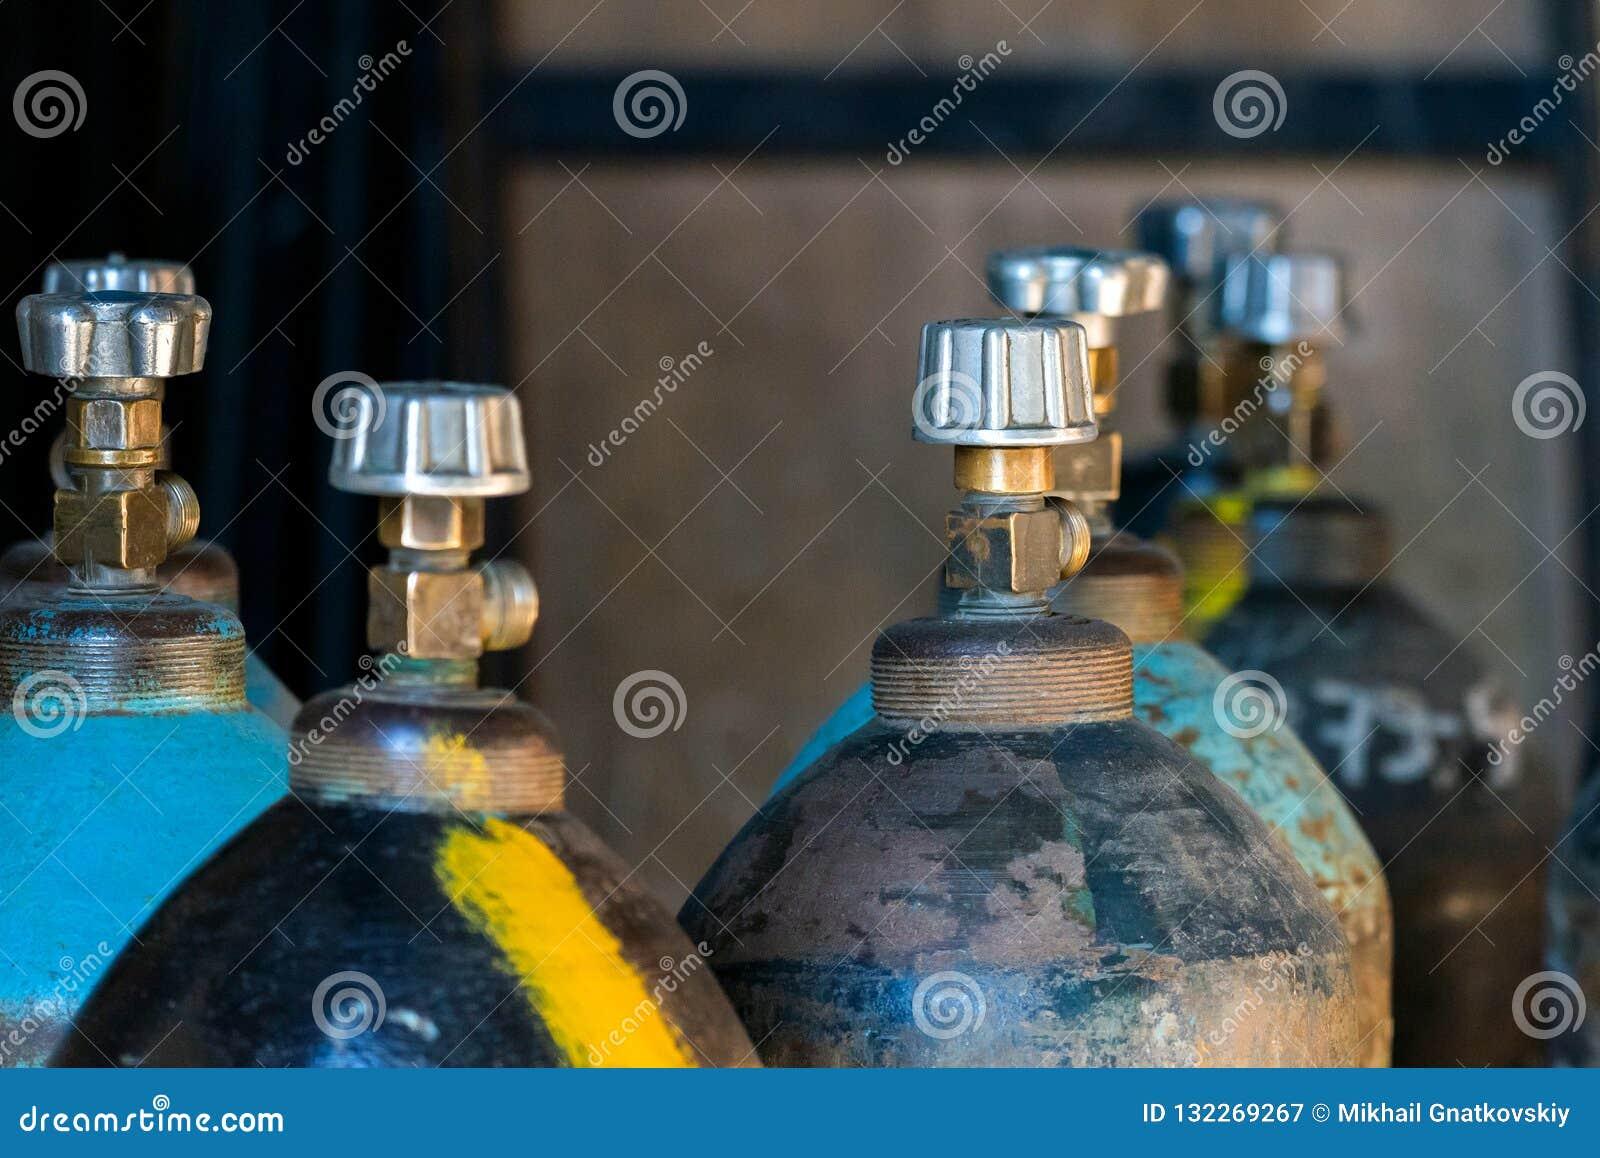 Cilinder met kooldioxide Tanks met samengeperst gas voor indu